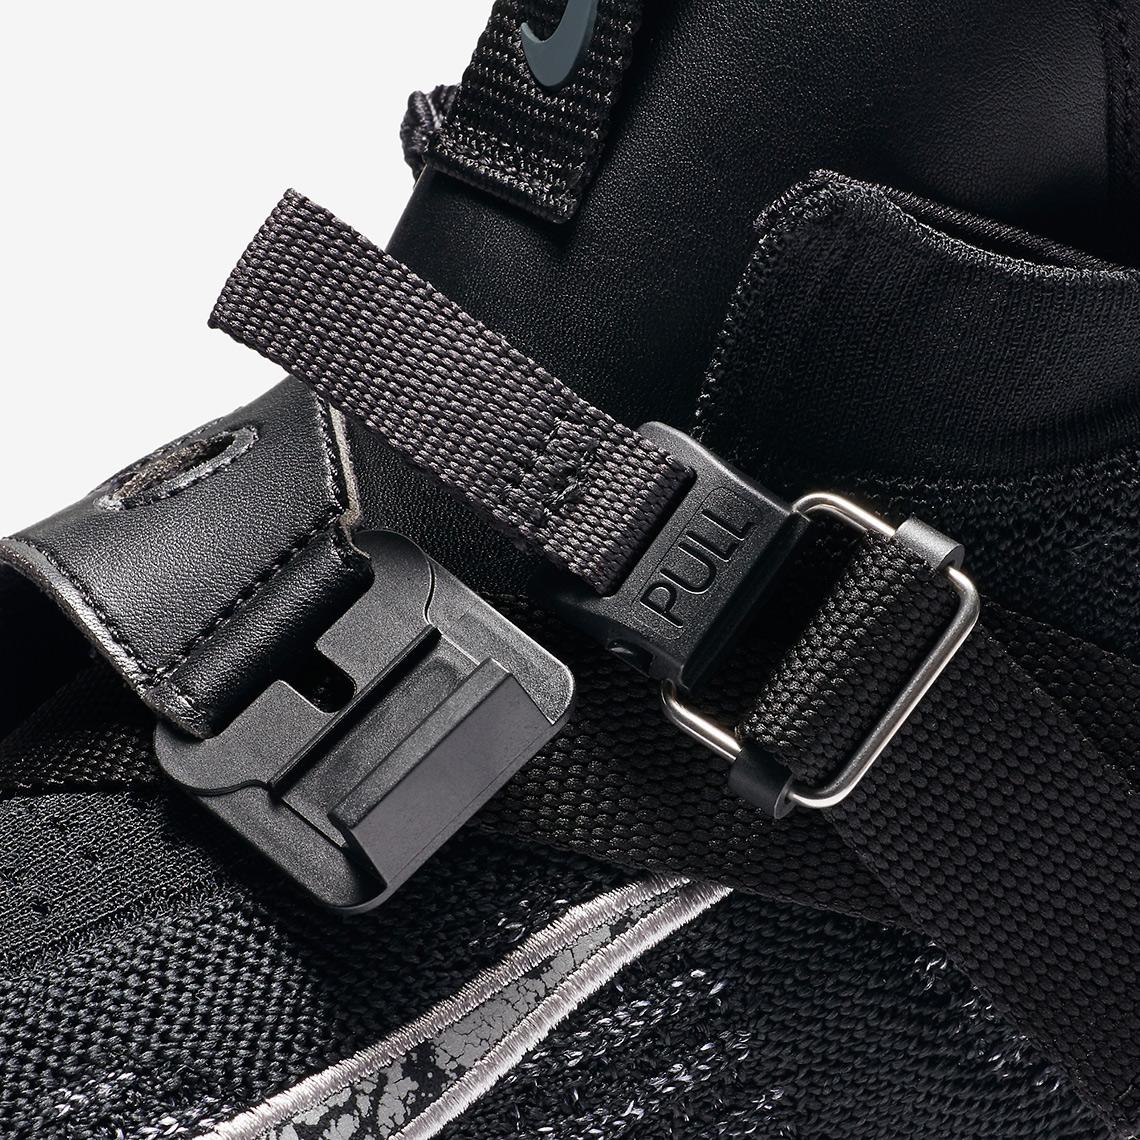 1fa5600df5f9 Nike Vapormax Premier Flyknit AO3241-002 + AO3241-001